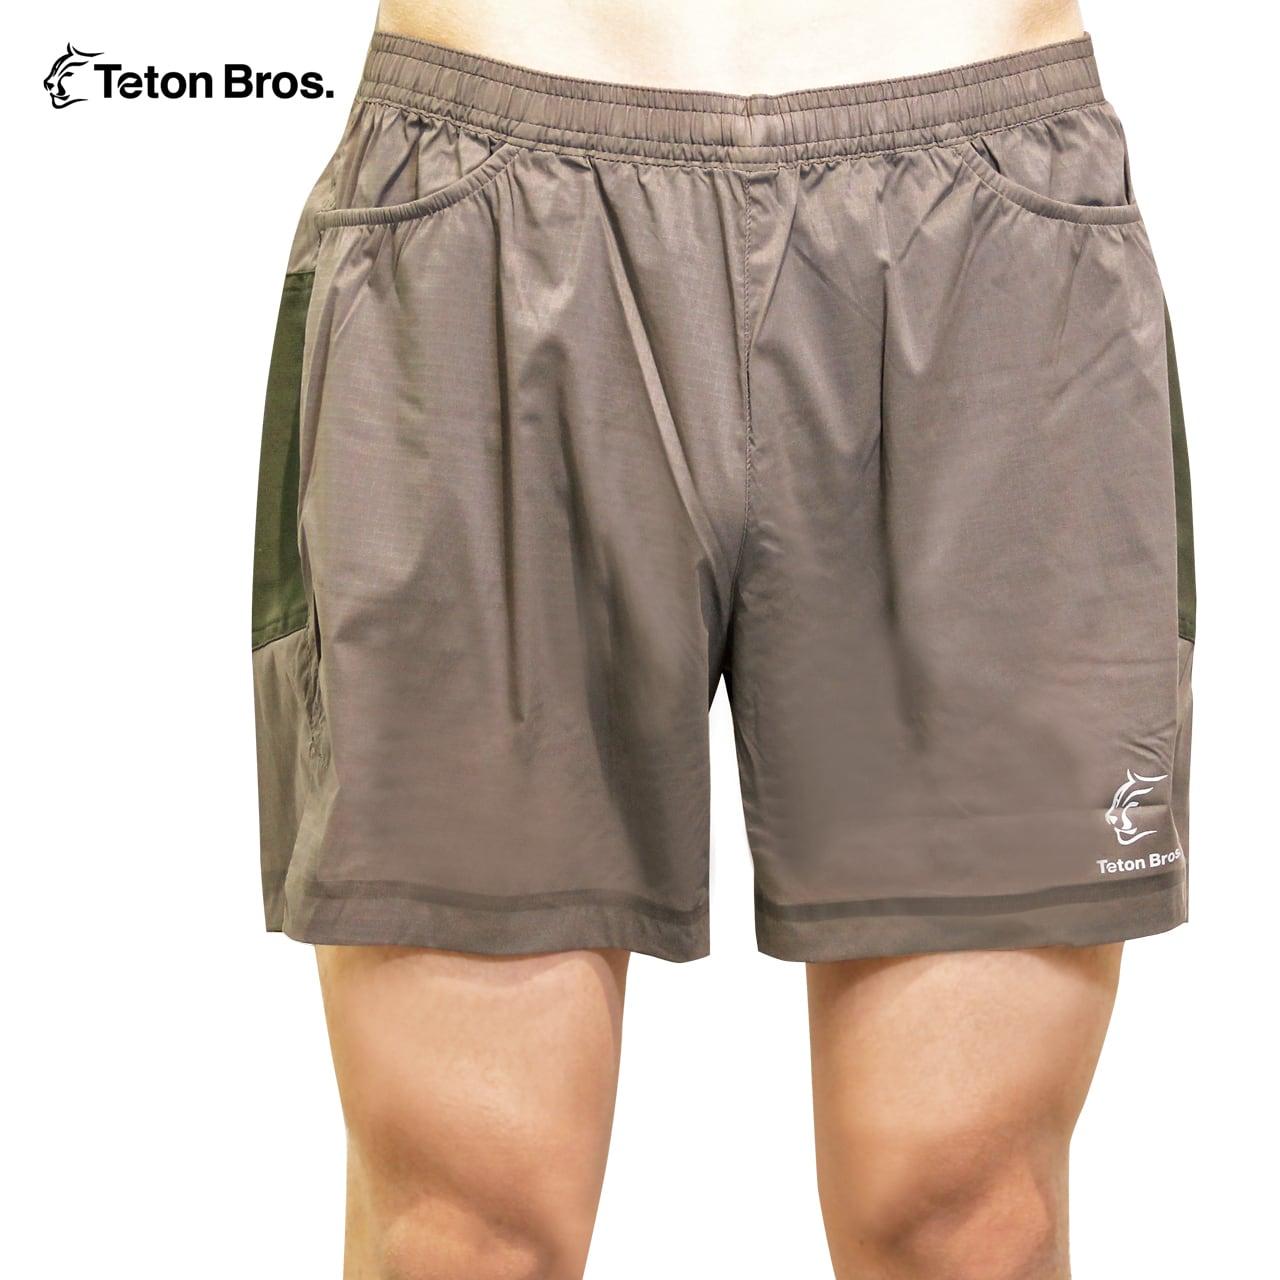 Teton Bros. ELV1000   5in  Hybrid short  Brown